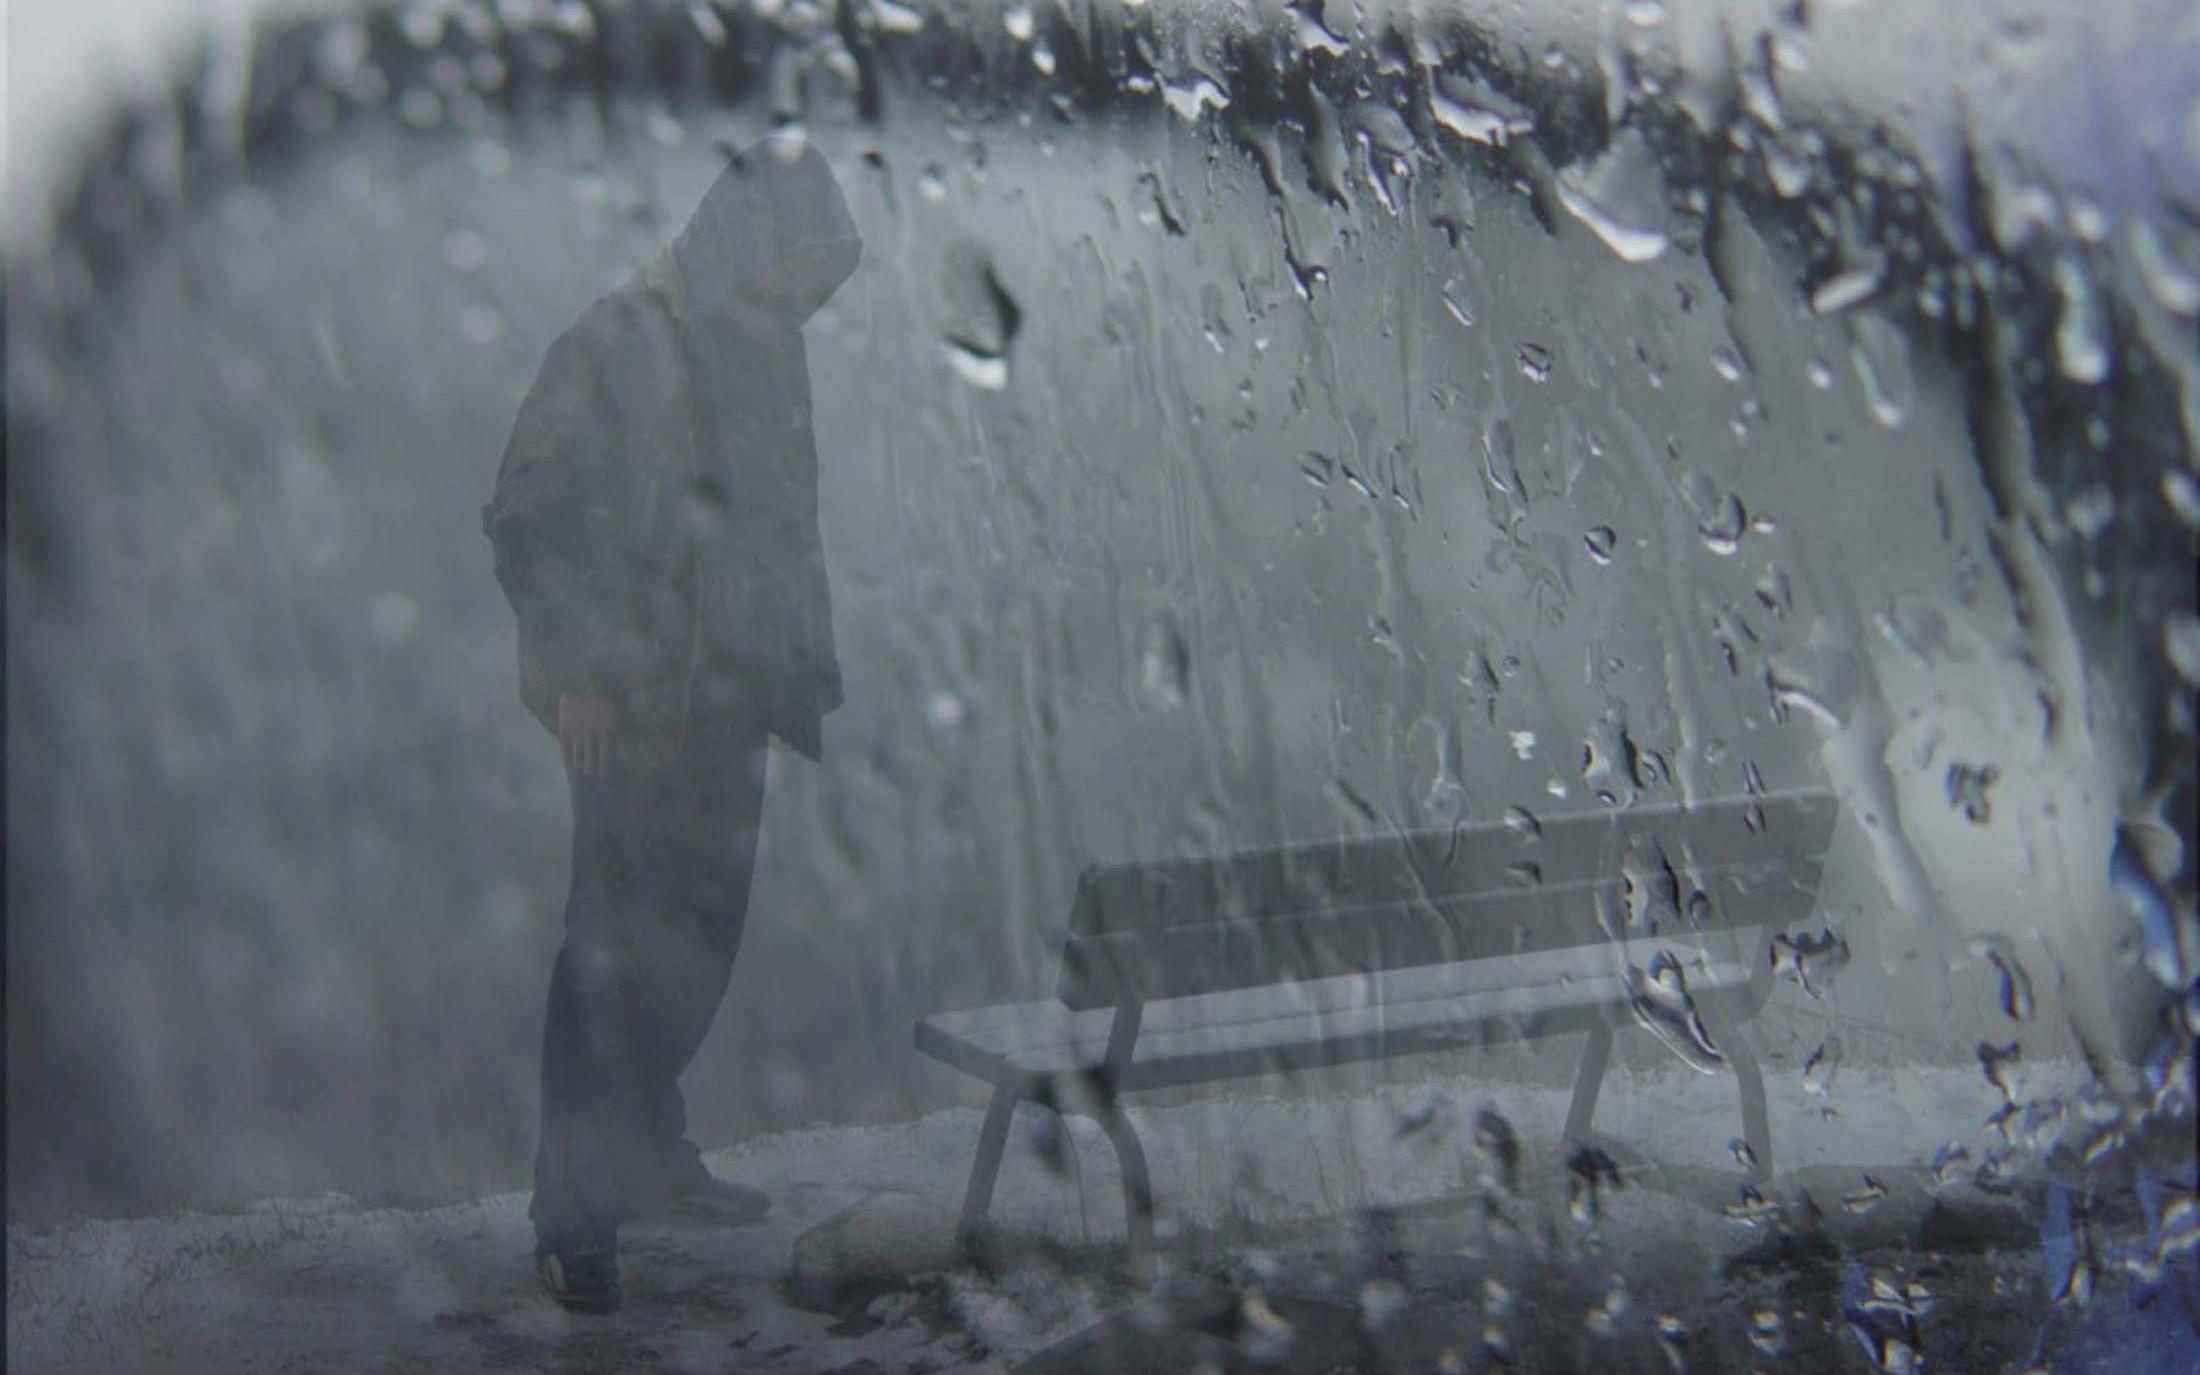 sad rainy movie scene - HD1024×768